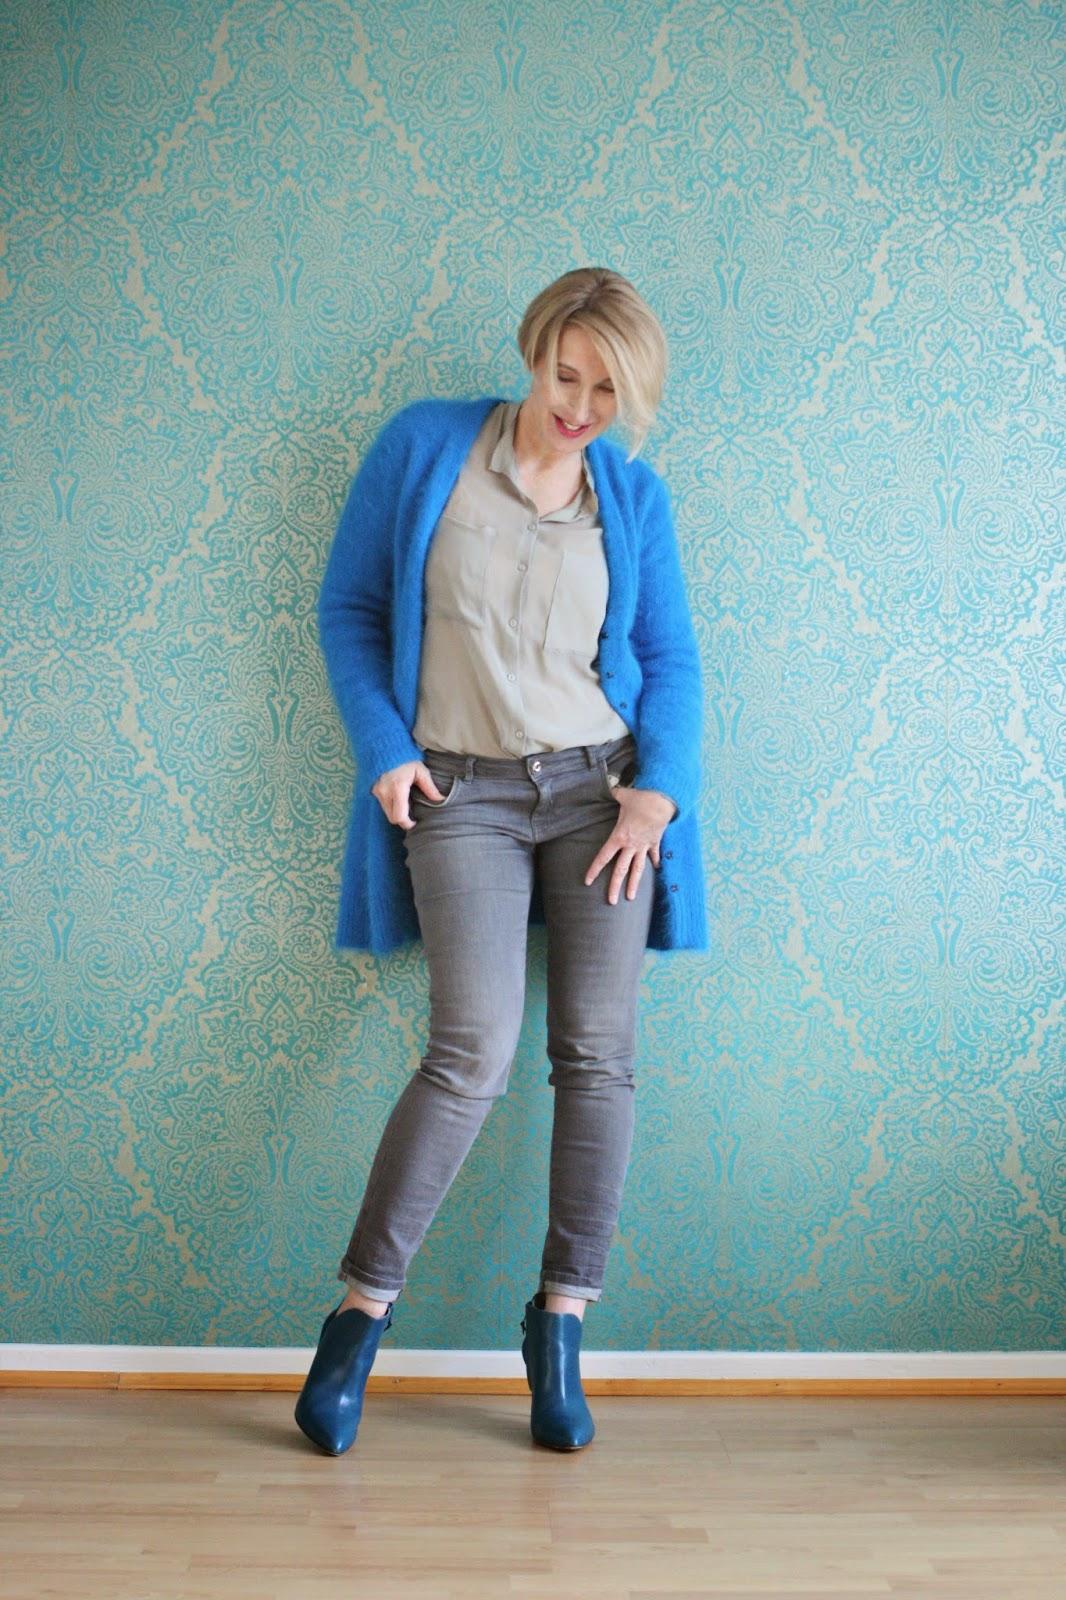 Blaue Strickjacke mit grau kombiniert